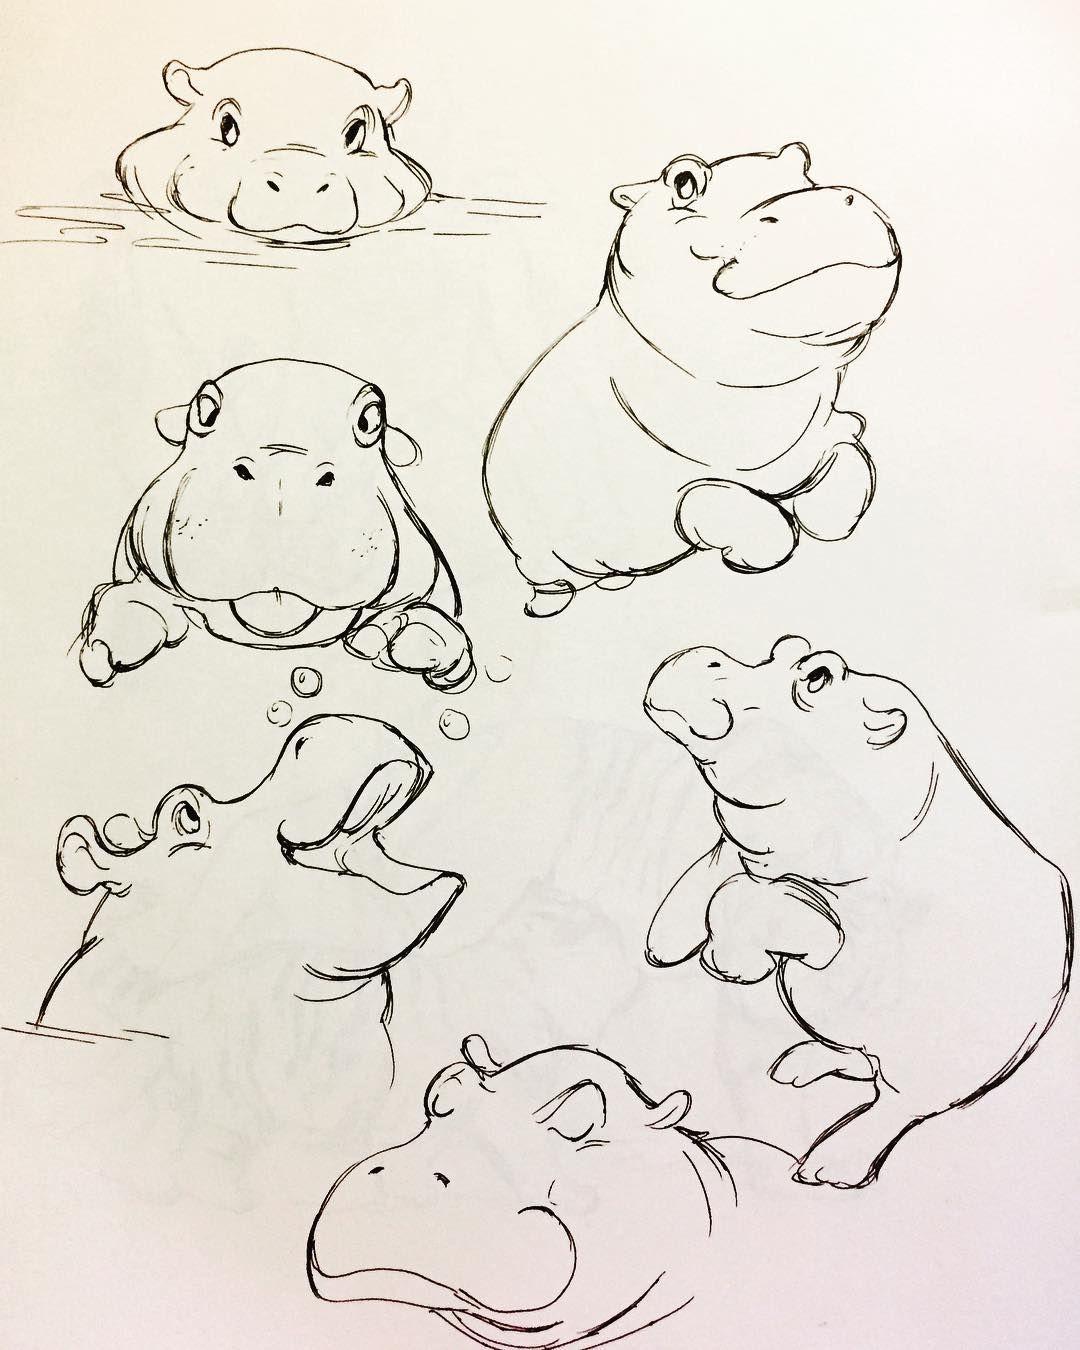 baby hippos #art #animals #nohippoemojismh #sketch #babyhippo